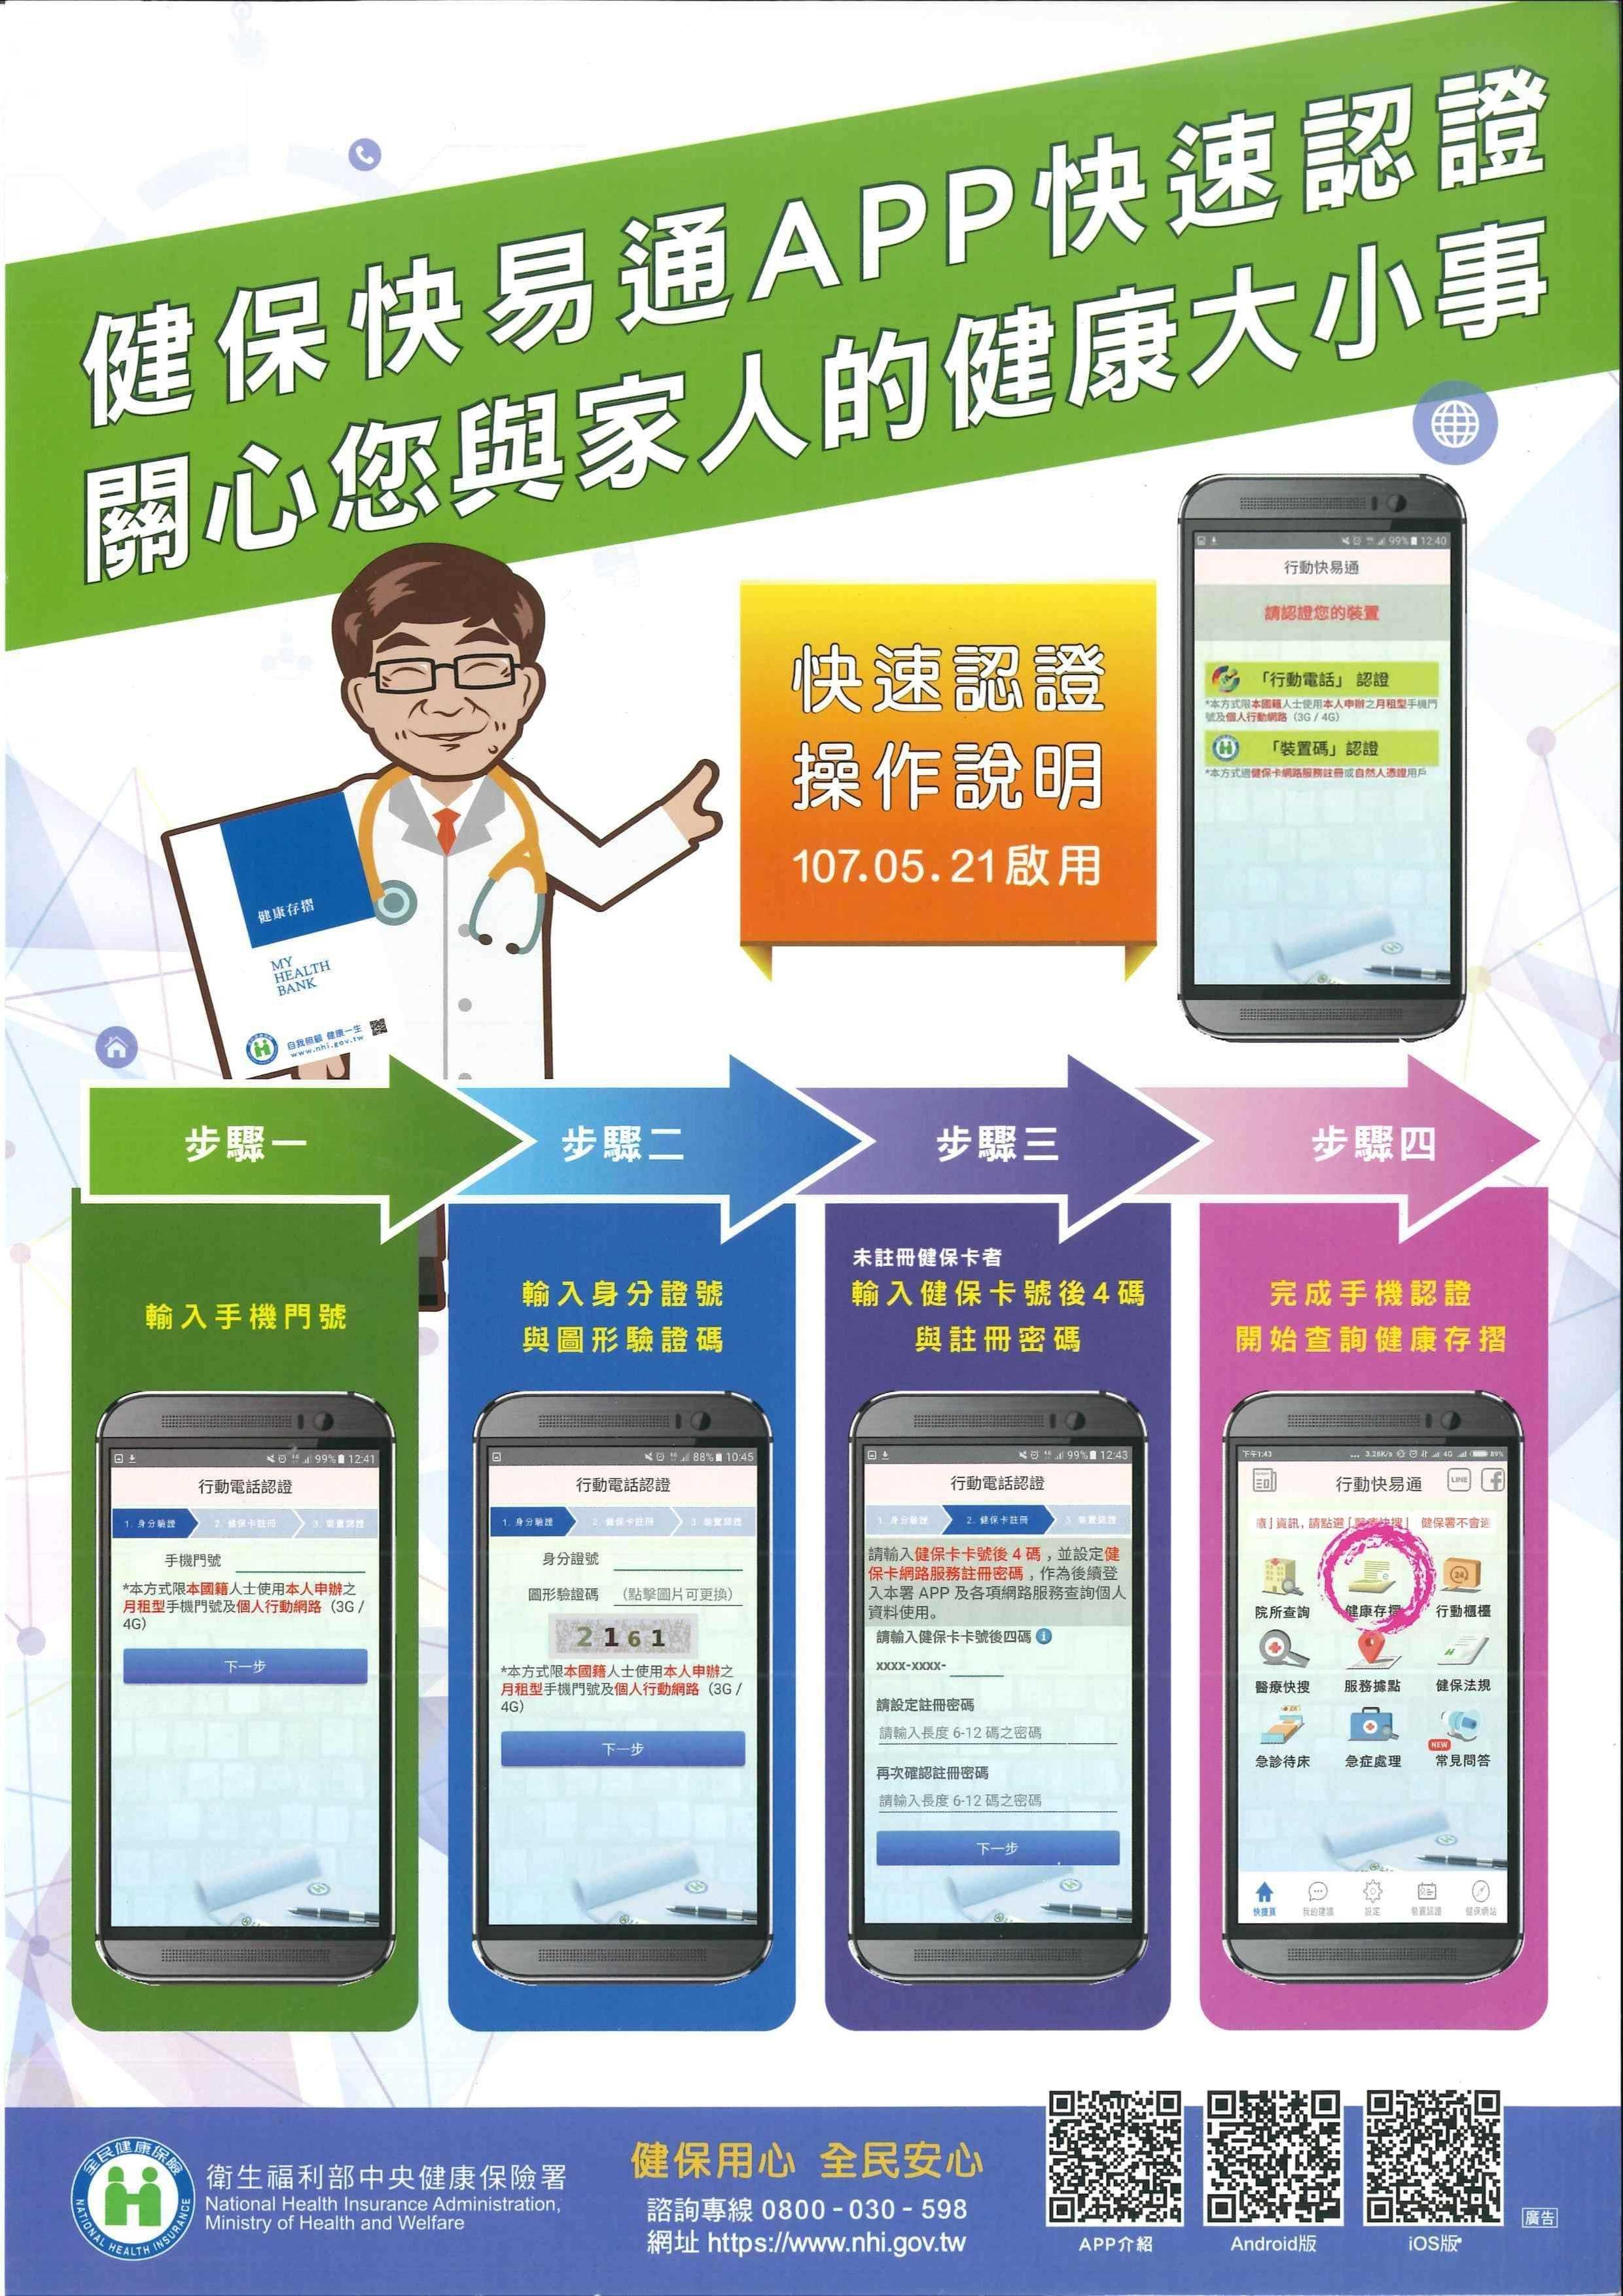 proimages/外籍停復健保行動居家app3.jpg